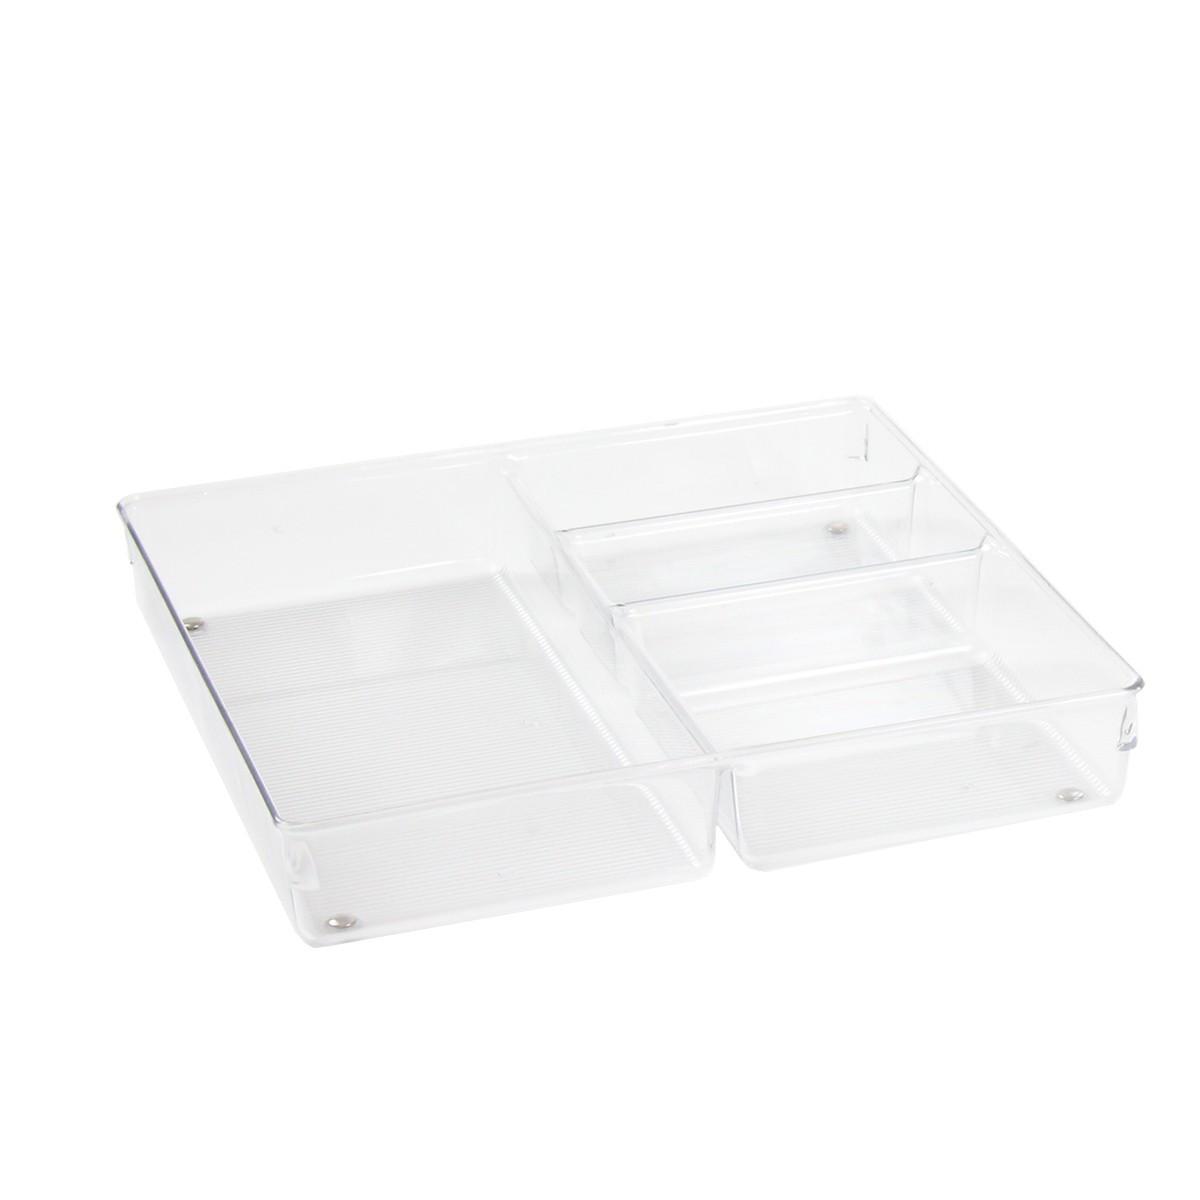 Organisateur de tiroir transparent rangement couverts for Organisateur tiroir